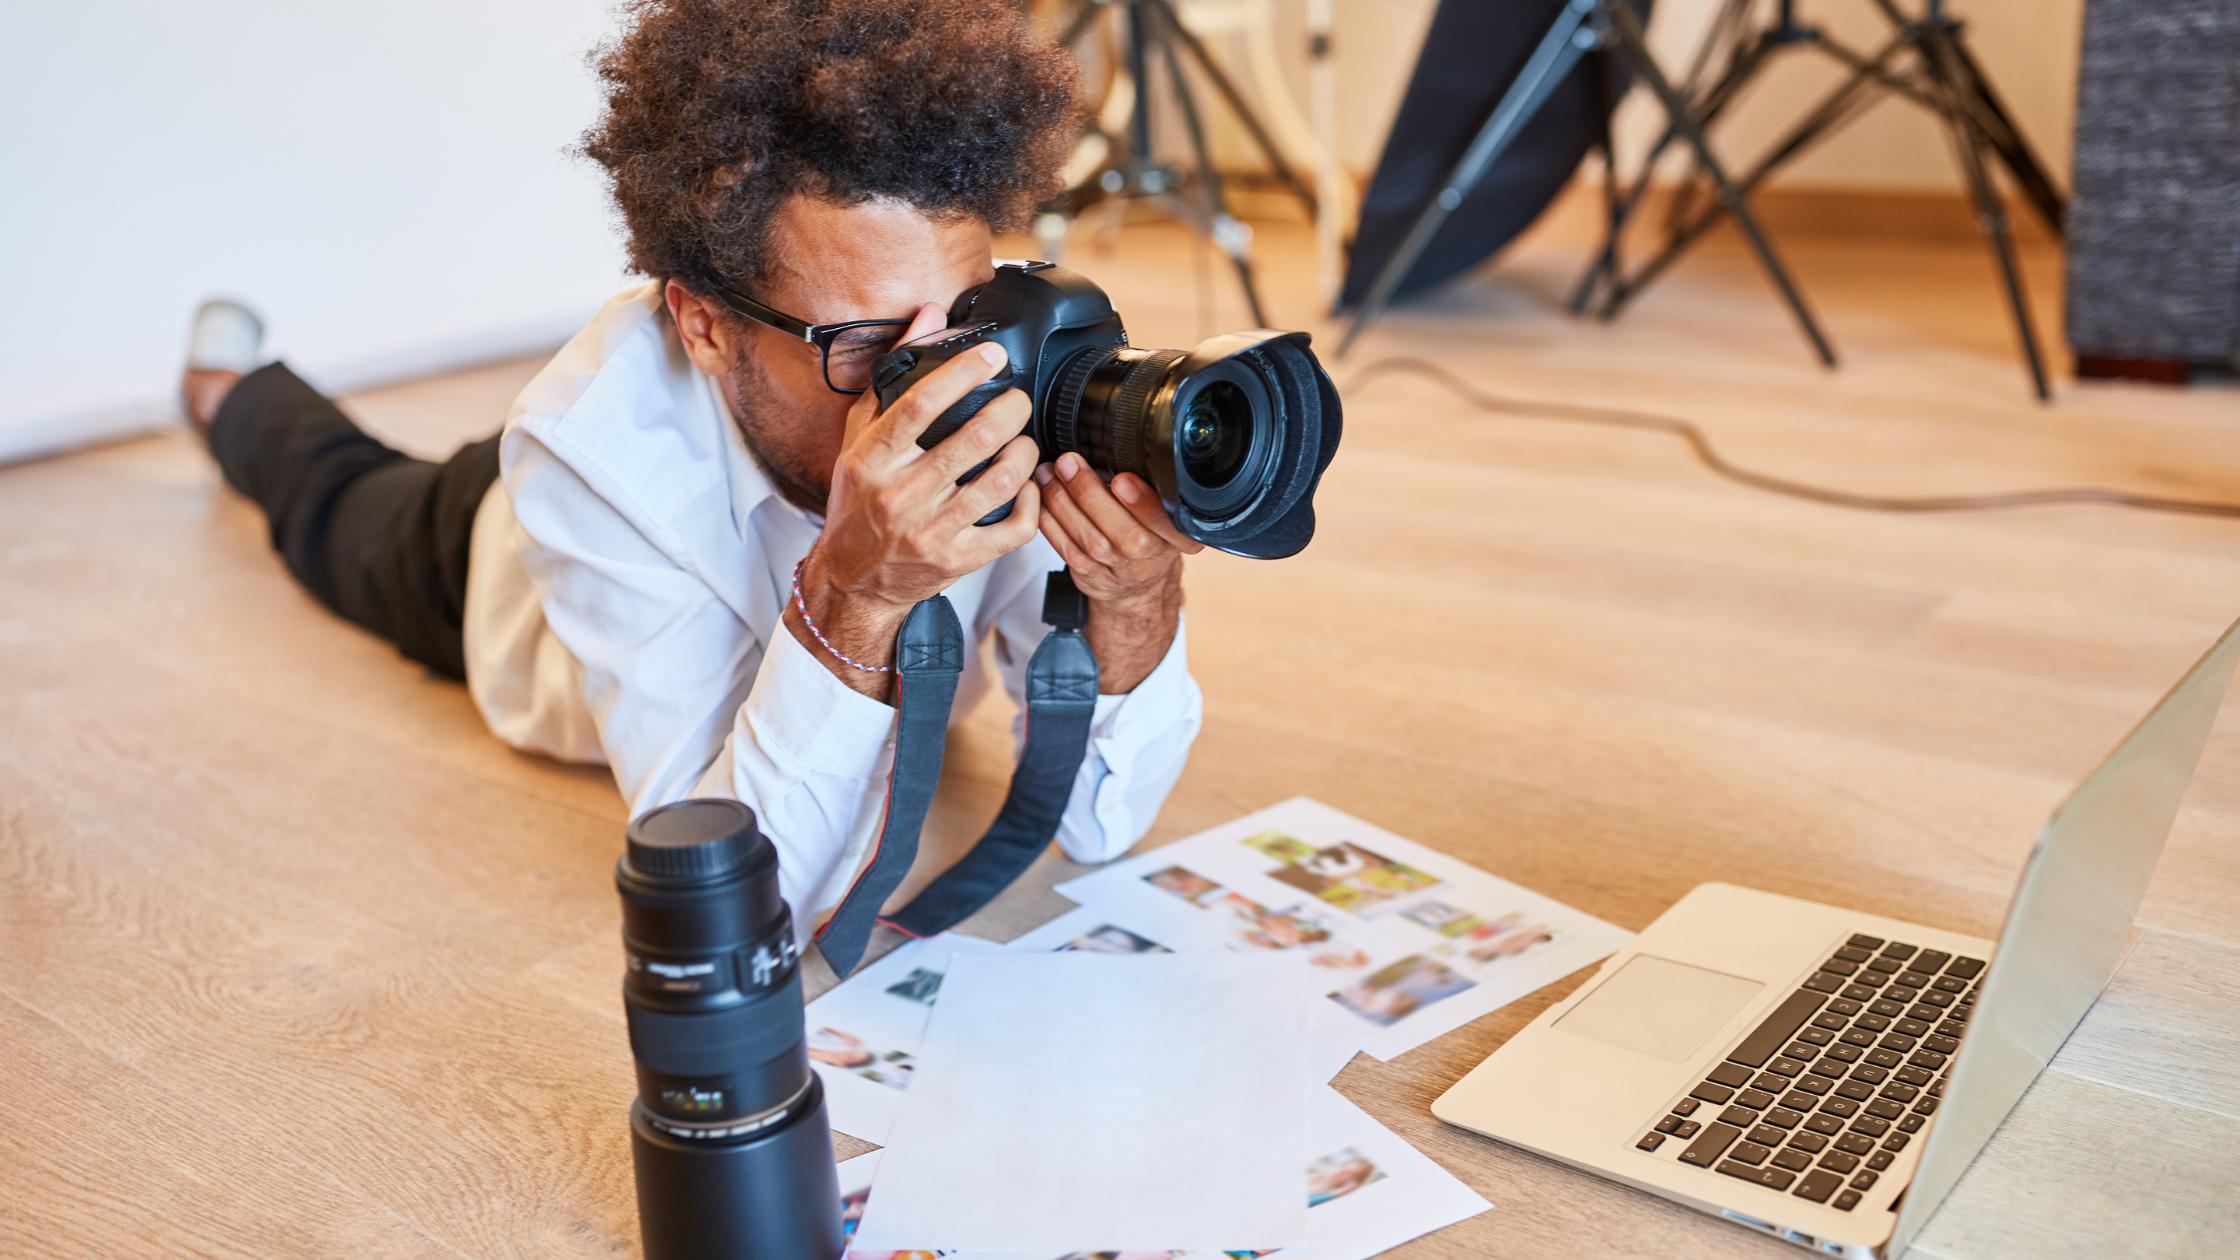 Produktfotos - how to